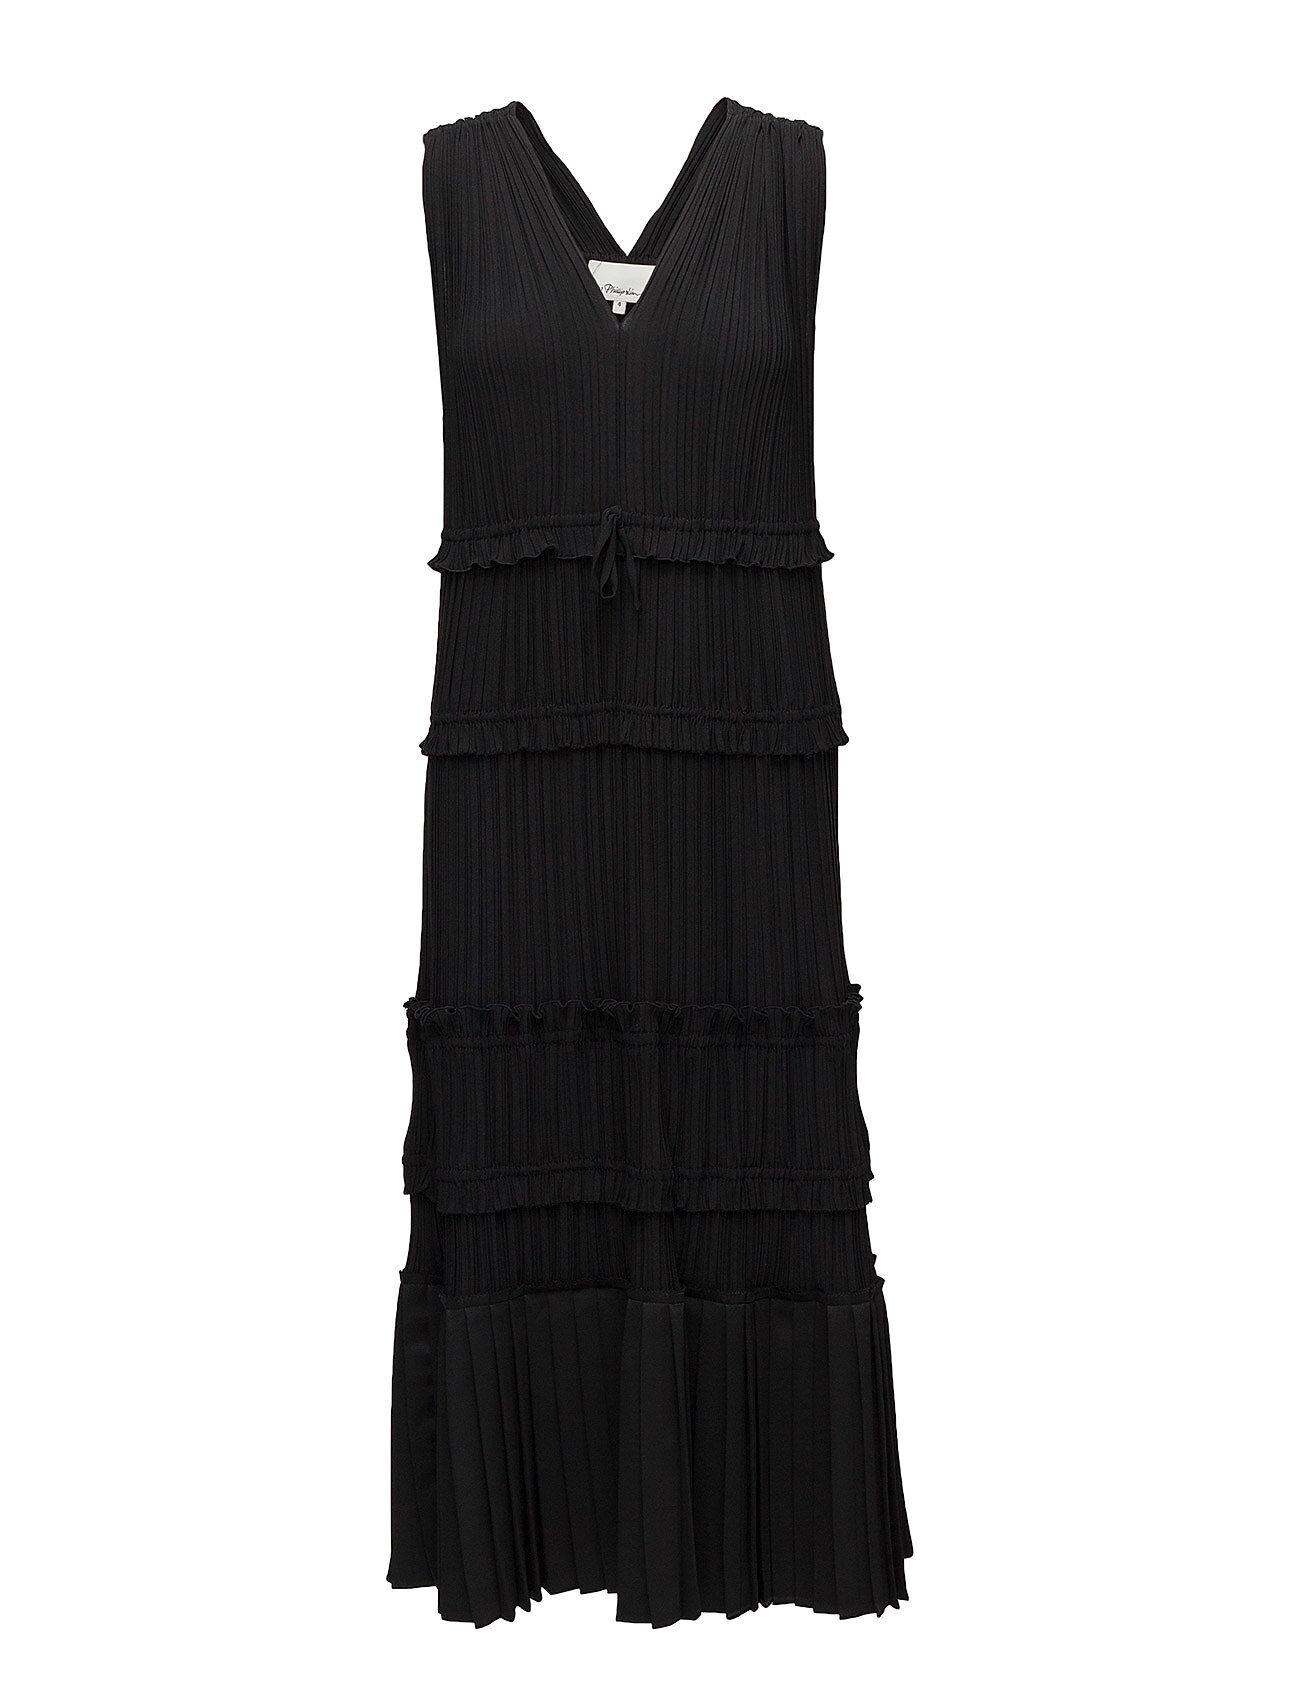 3.1 Phillip Lim Sl Pleated Vneck Dress